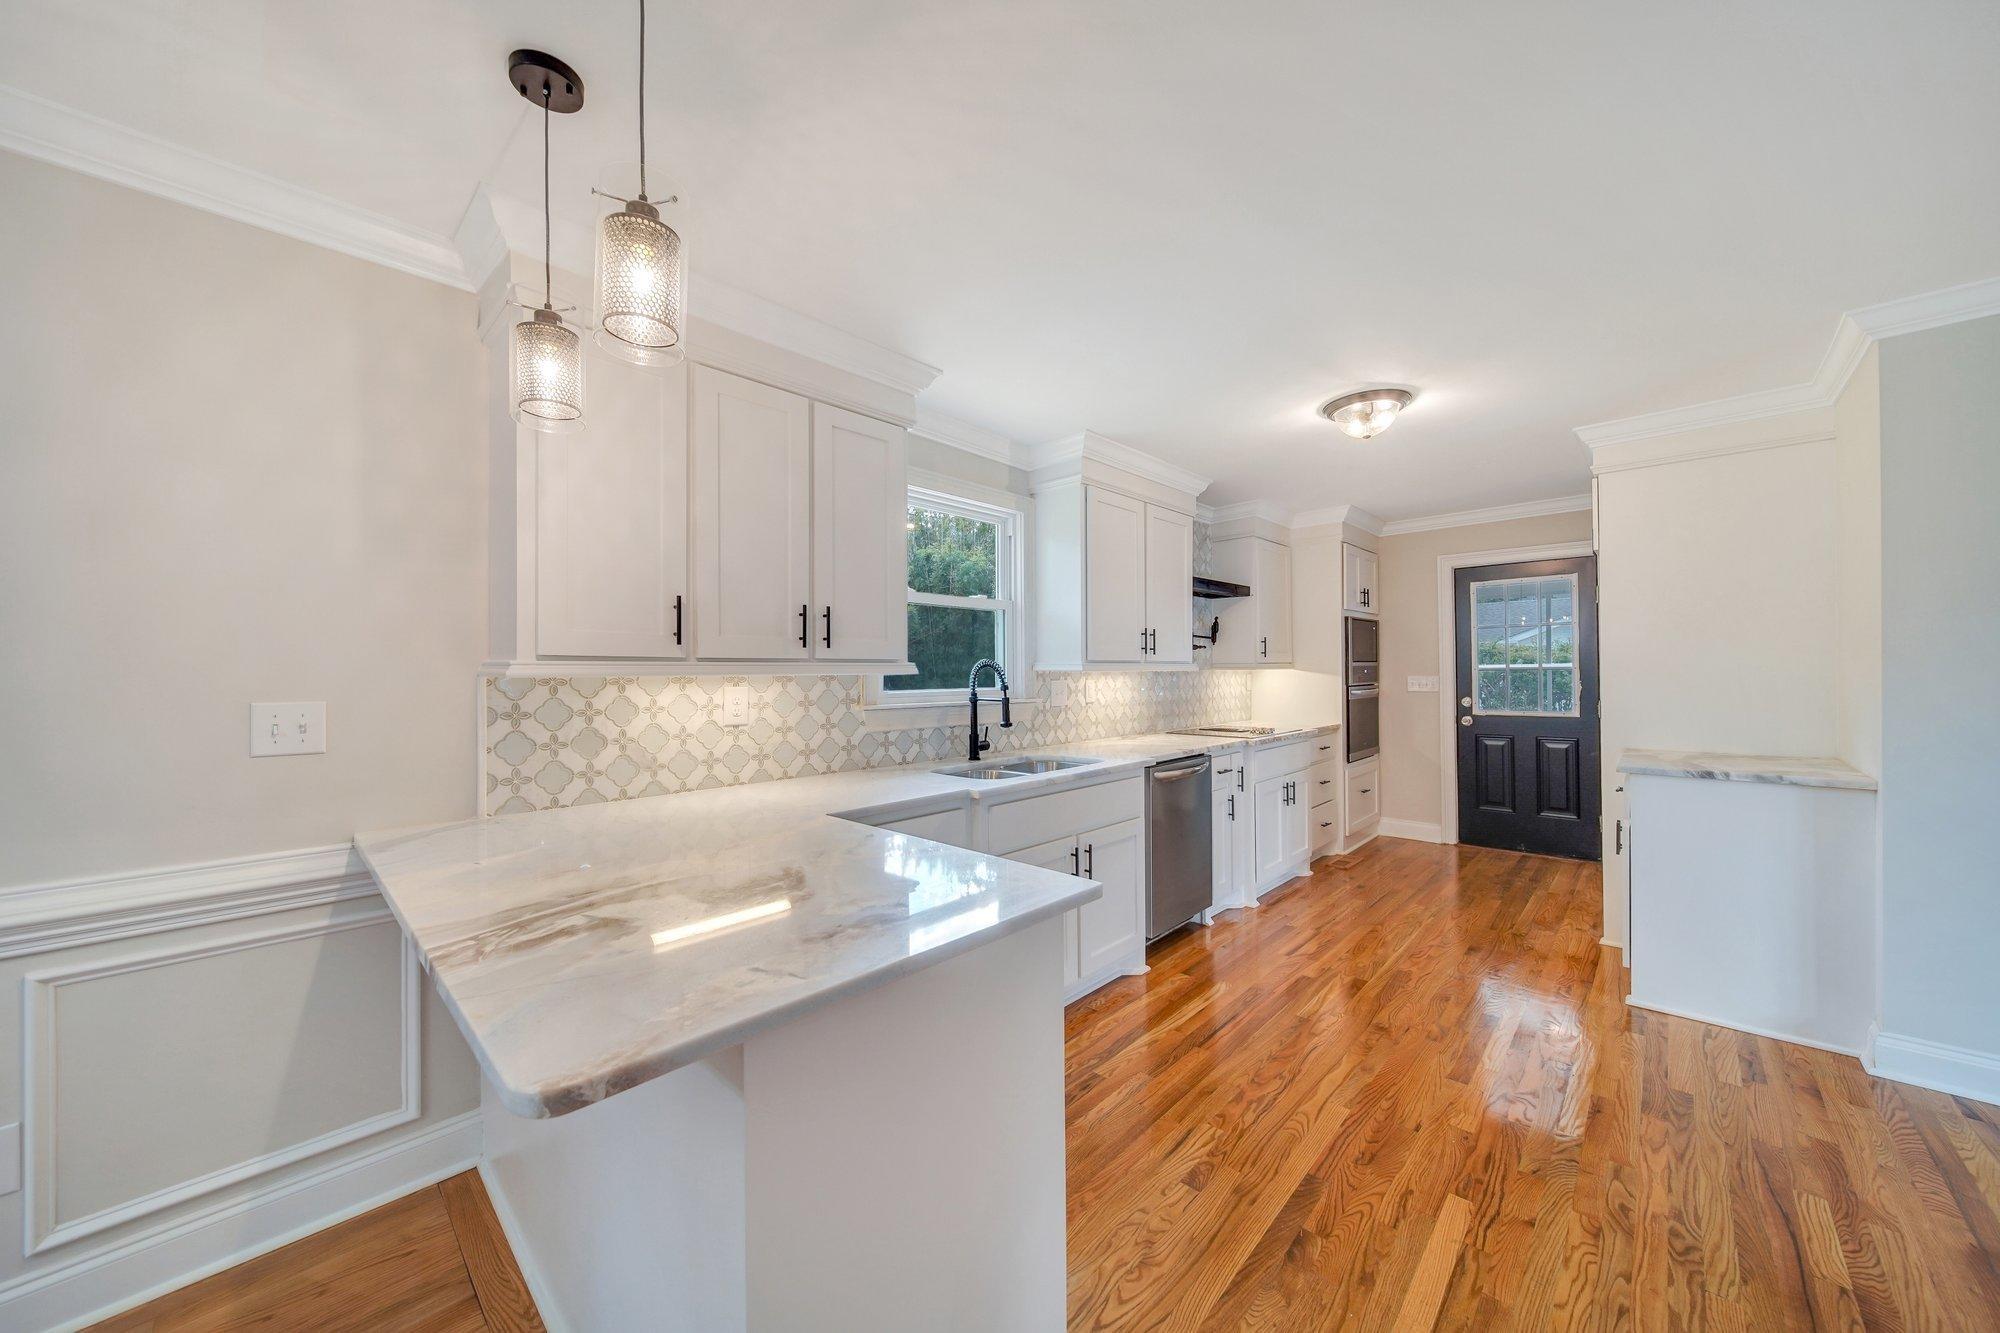 Country Club II Homes For Sale - 1477 Burningtree, Charleston, SC - 7